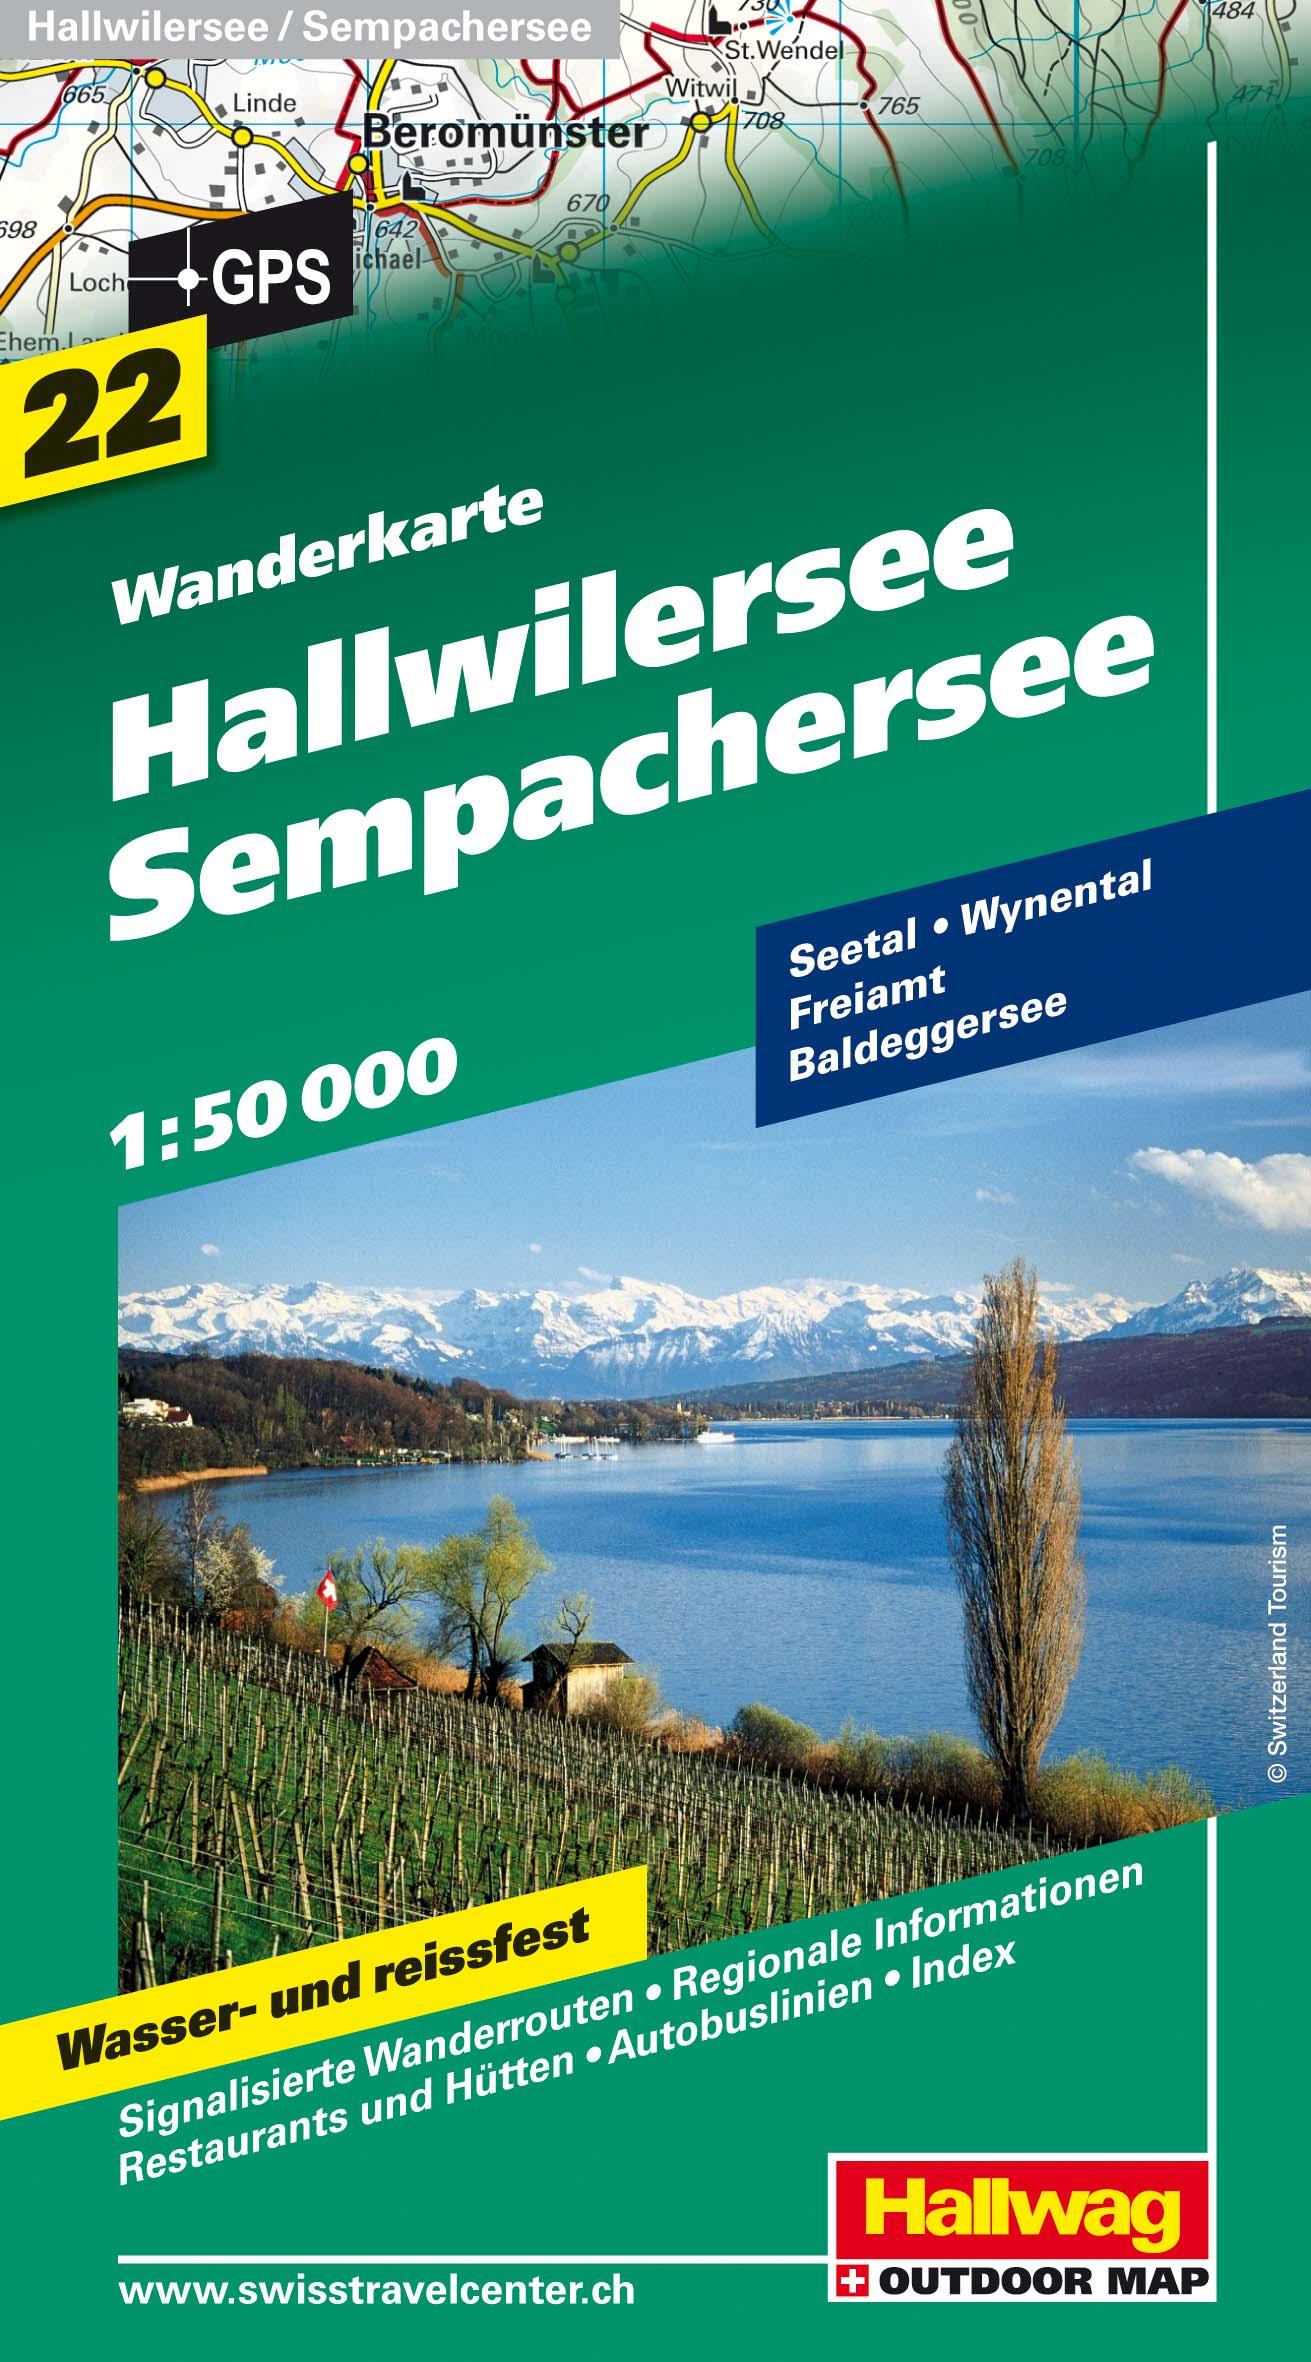 Hallwilersee-Sempachersee 1 : 50.000